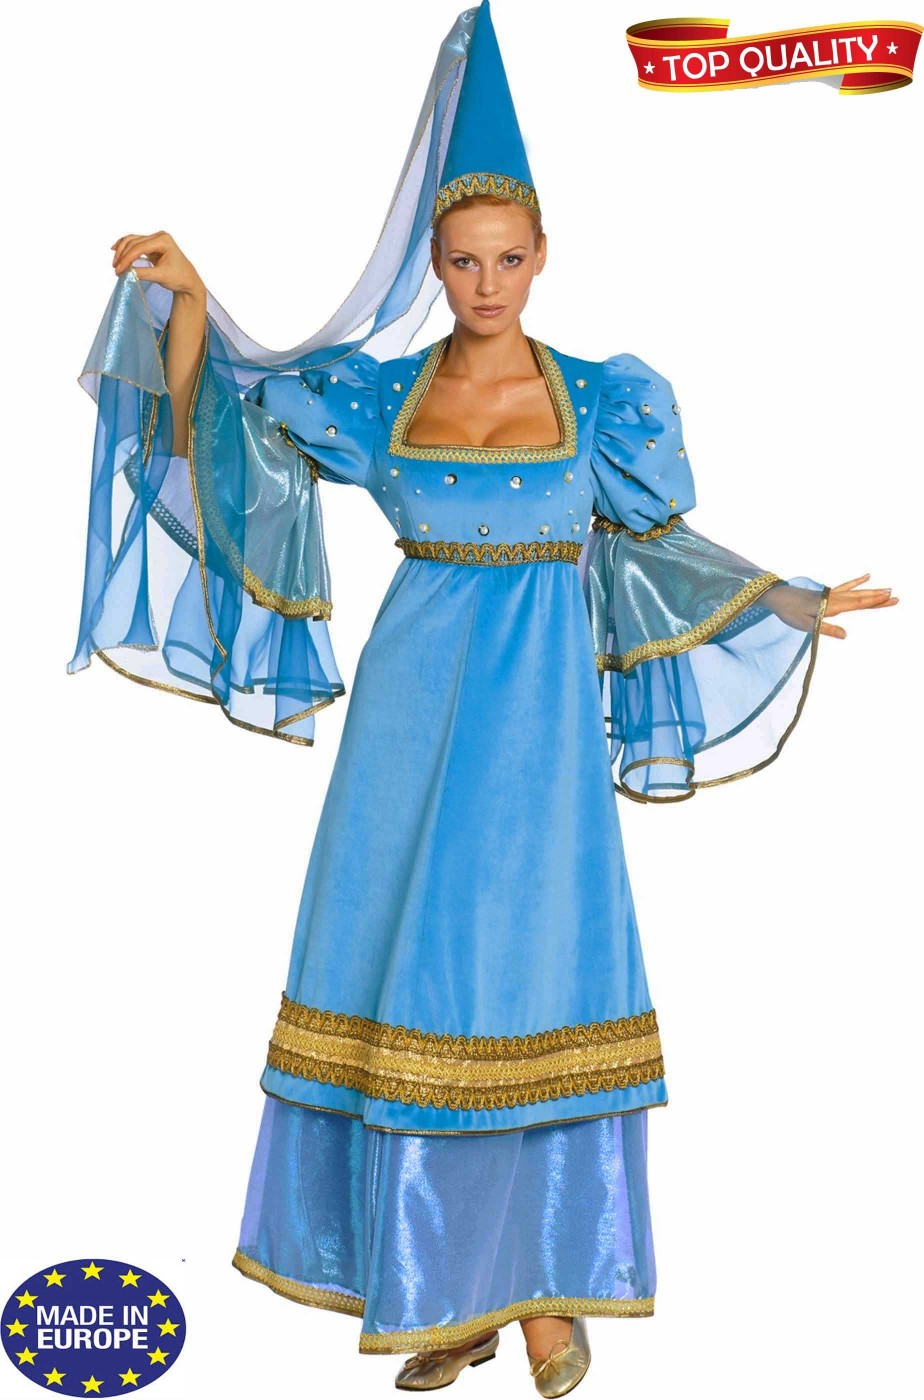 Vestito fata turchina o dama nobildonna medievale